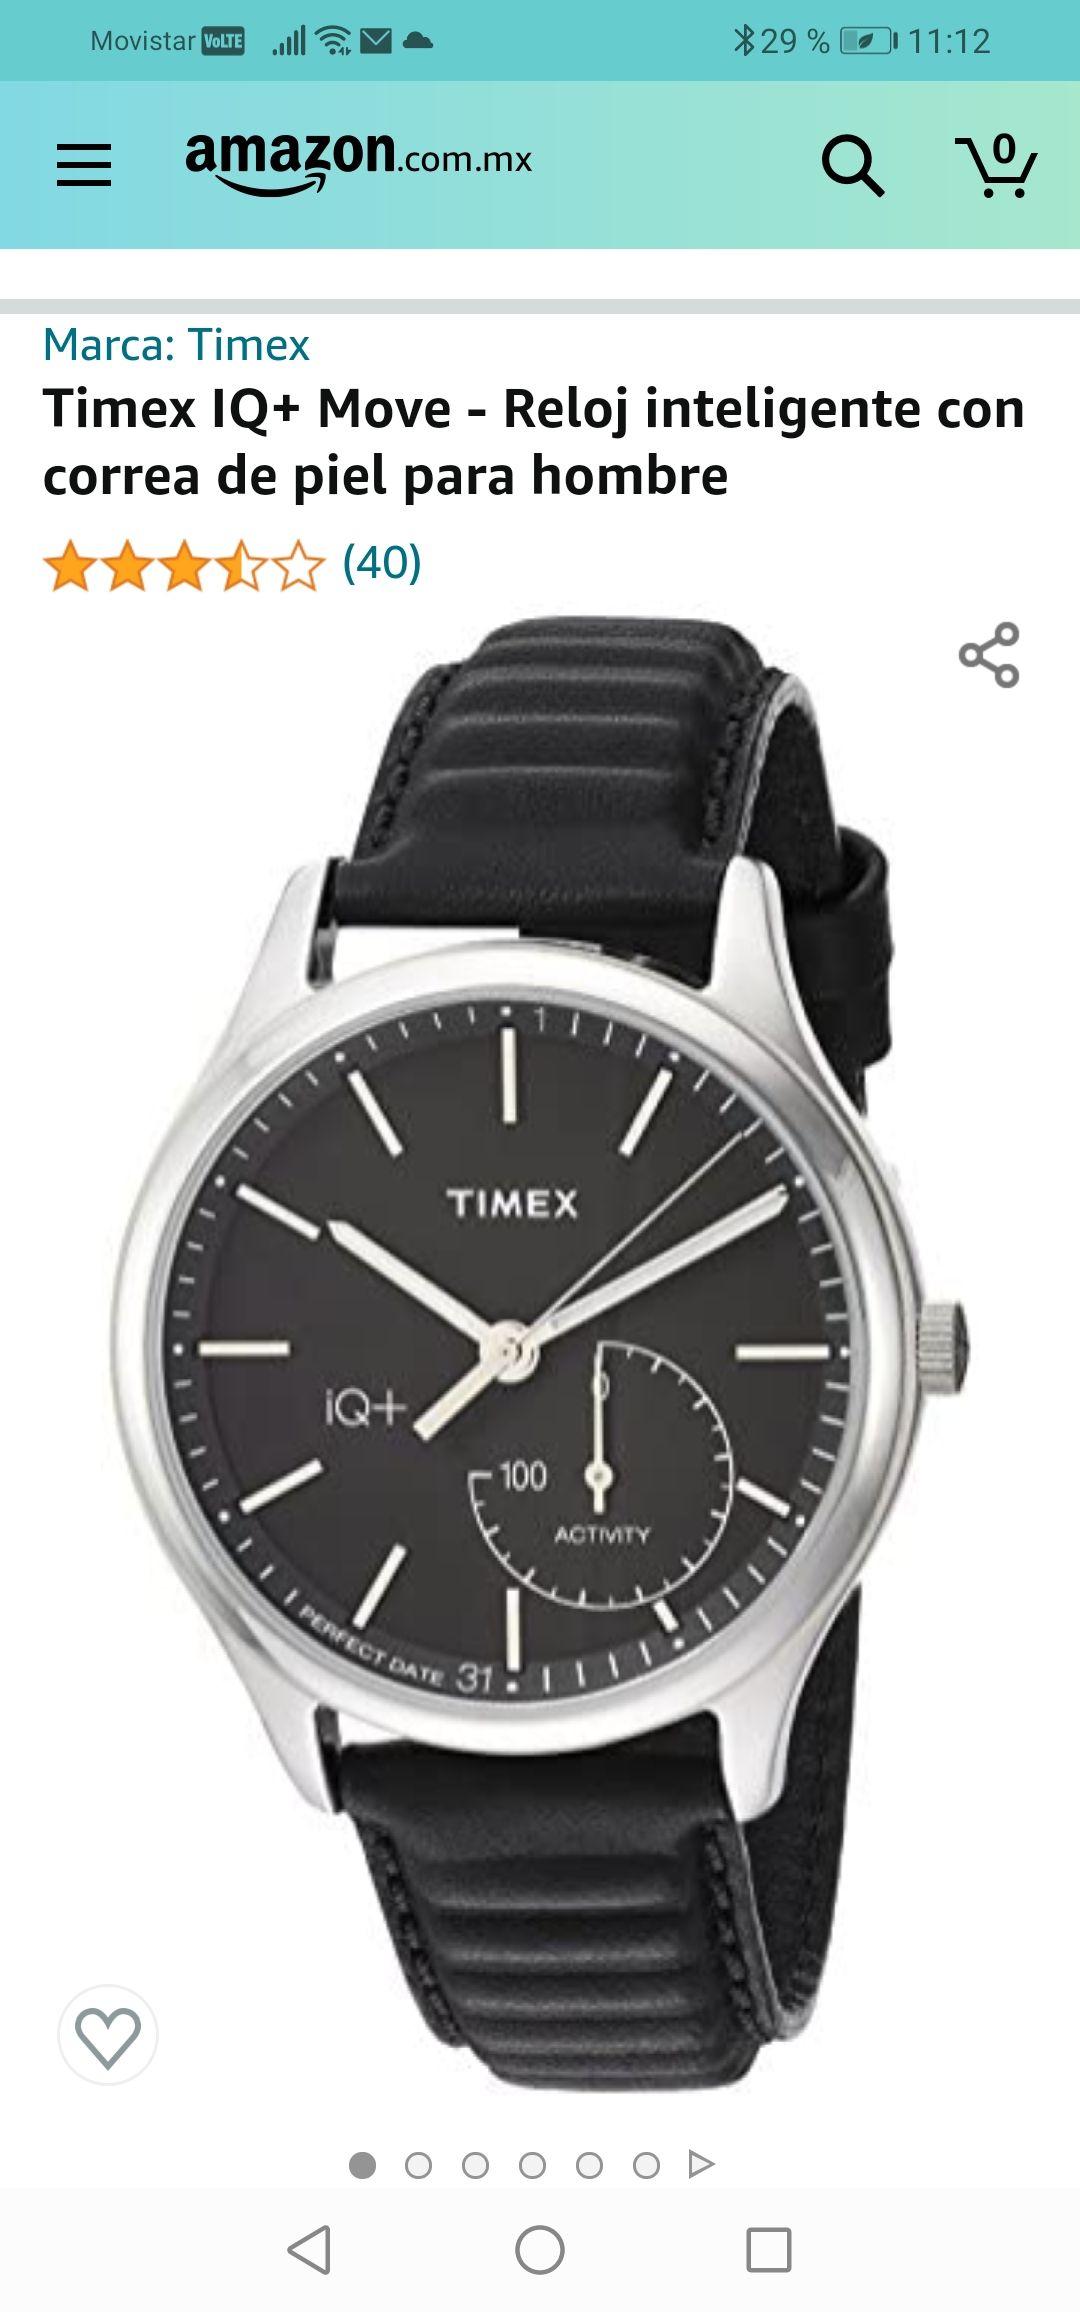 Amazon : Reloj inteligente Timex IQ